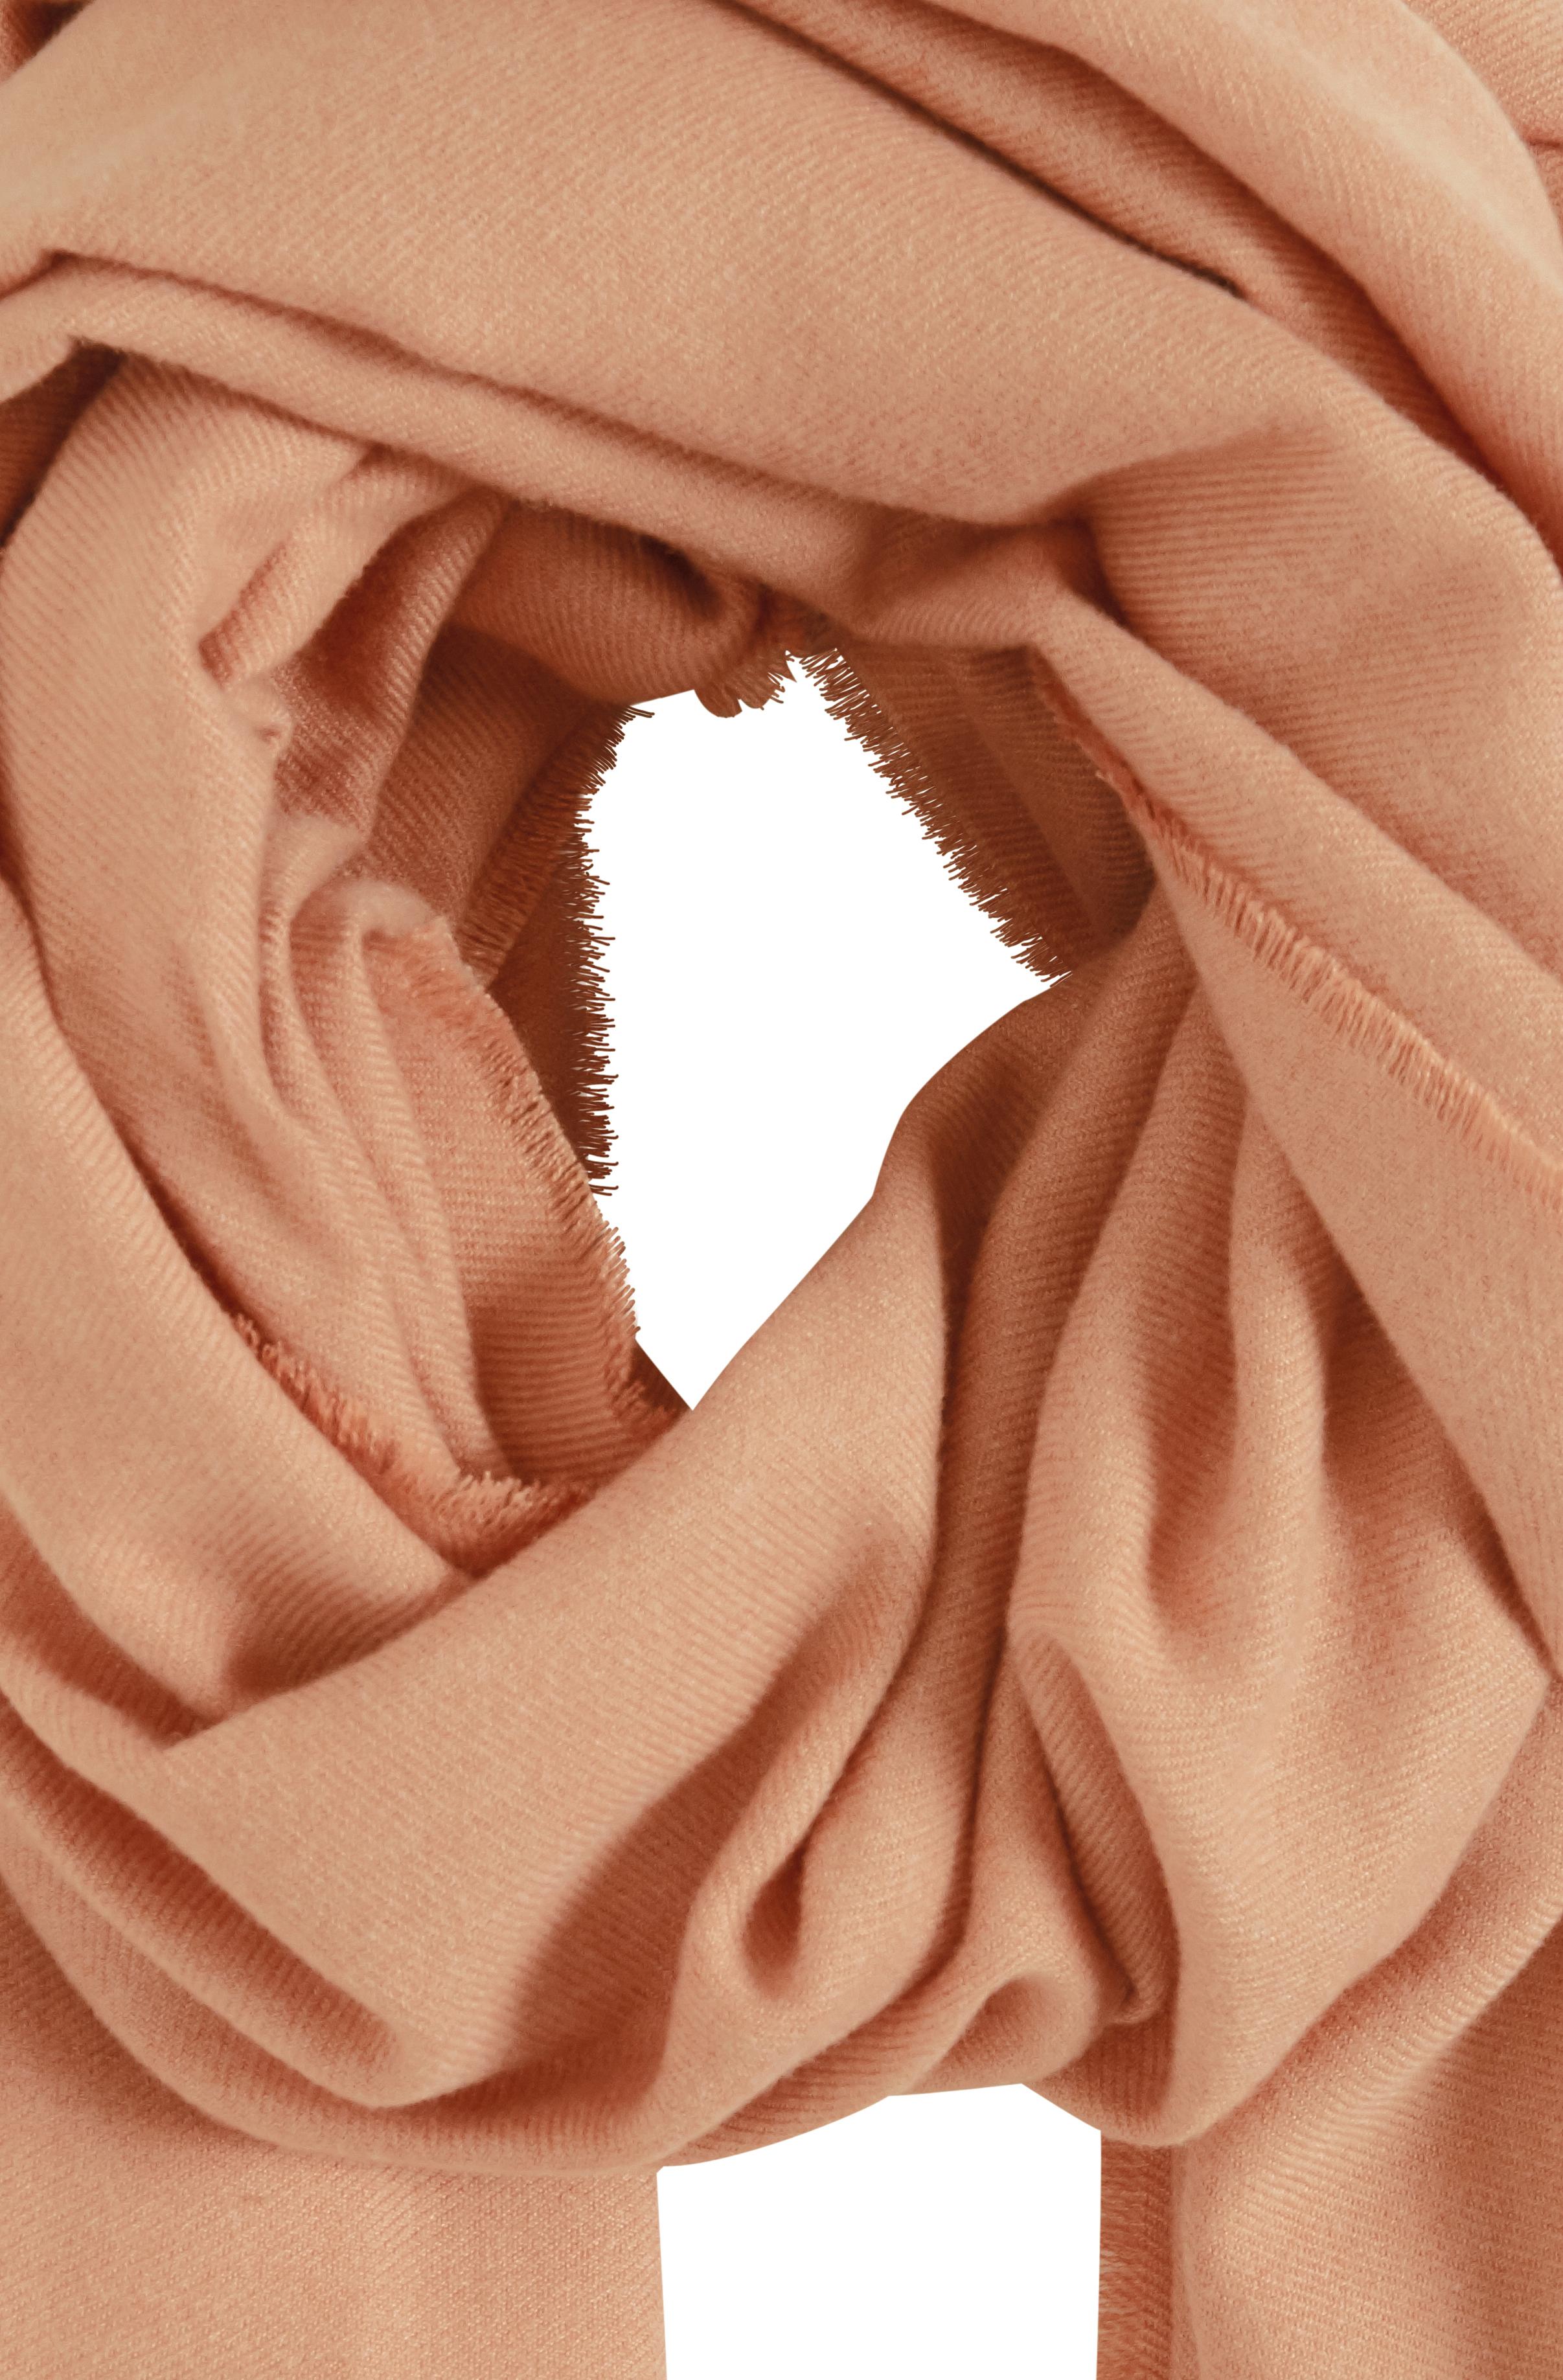 Canyon Clay Tørklæde – Køb Canyon Clay Tørklæde fra str. ONE her